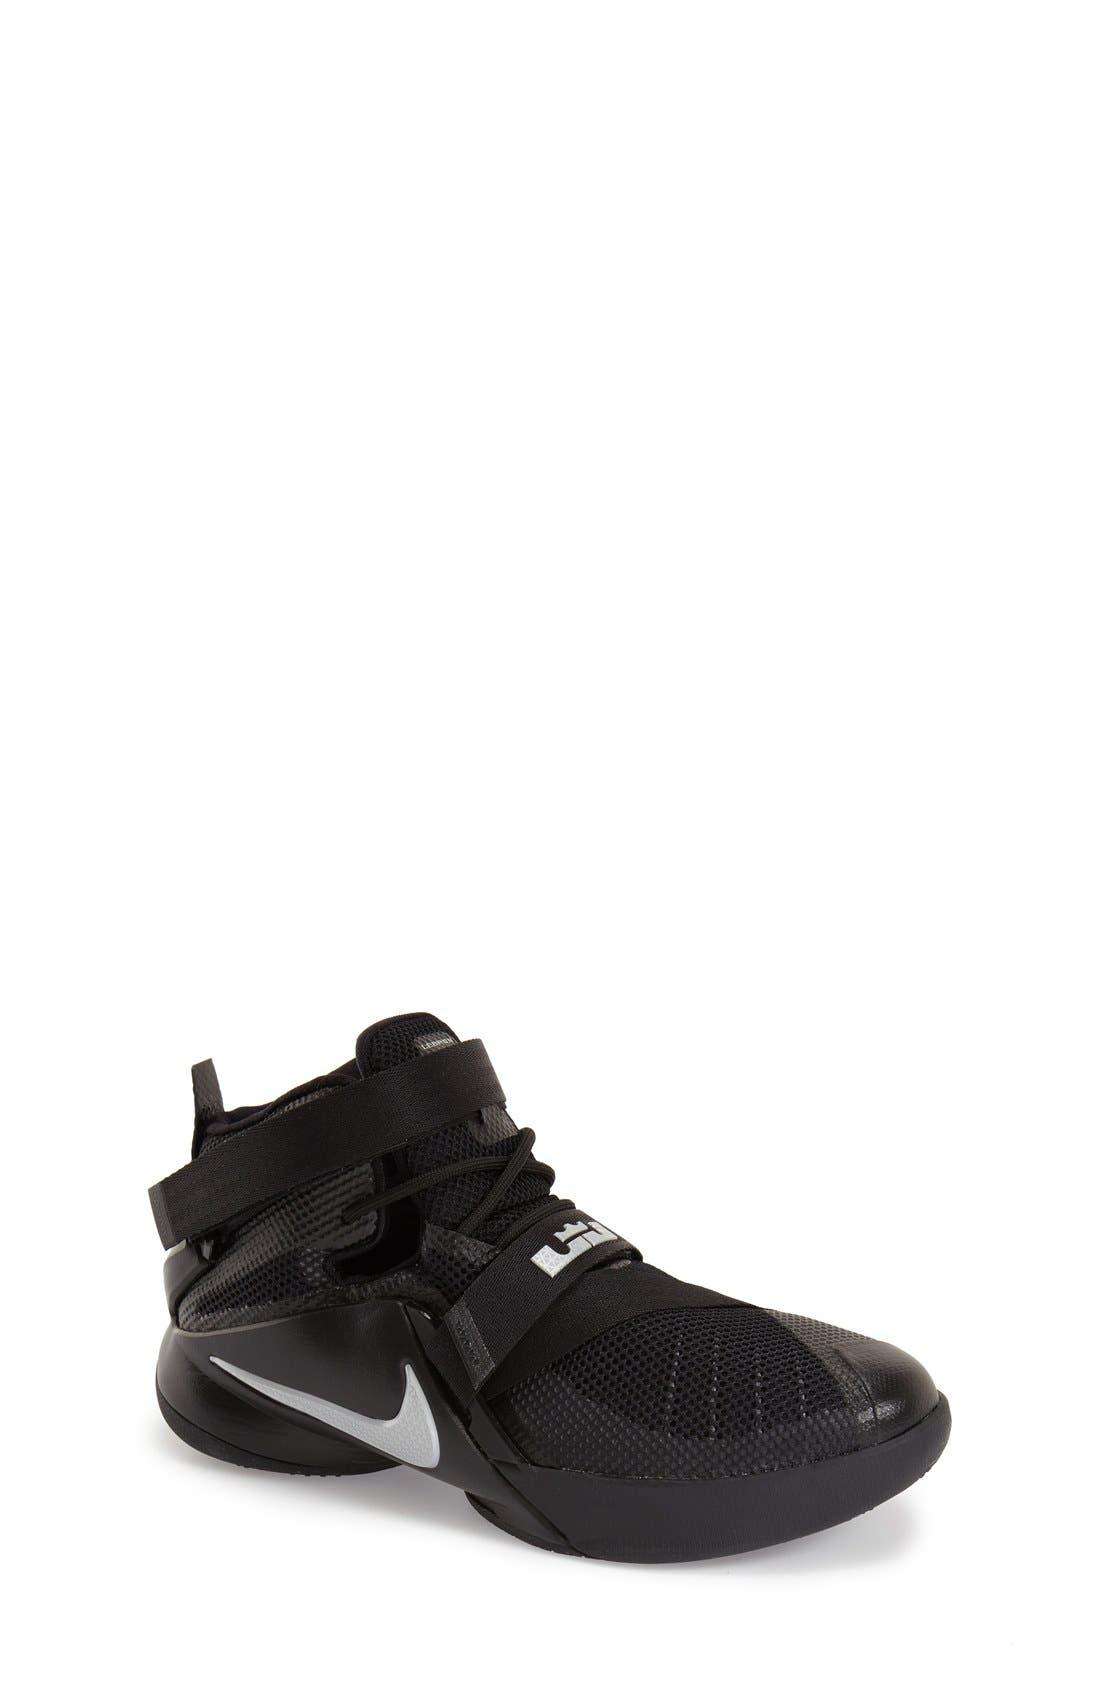 'LeBron Soldier 9' Basketball Shoe,                             Main thumbnail 1, color,                             001